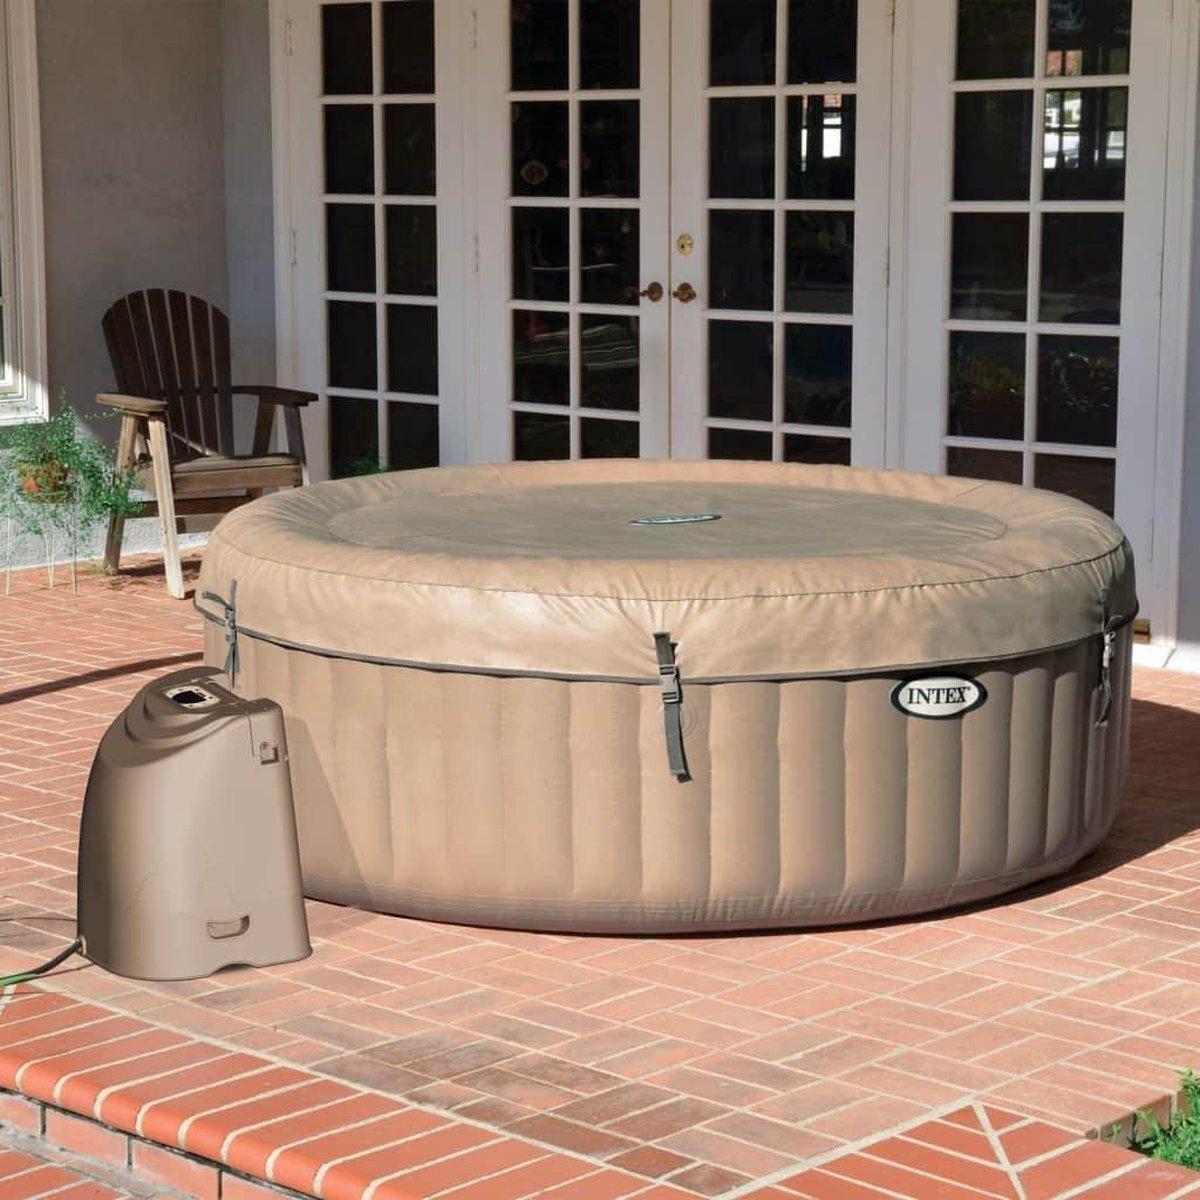 Intex PureSpa Opblaasbare spa met bubbelmassage 216x71 cm 6 persoons Steun Lokaal